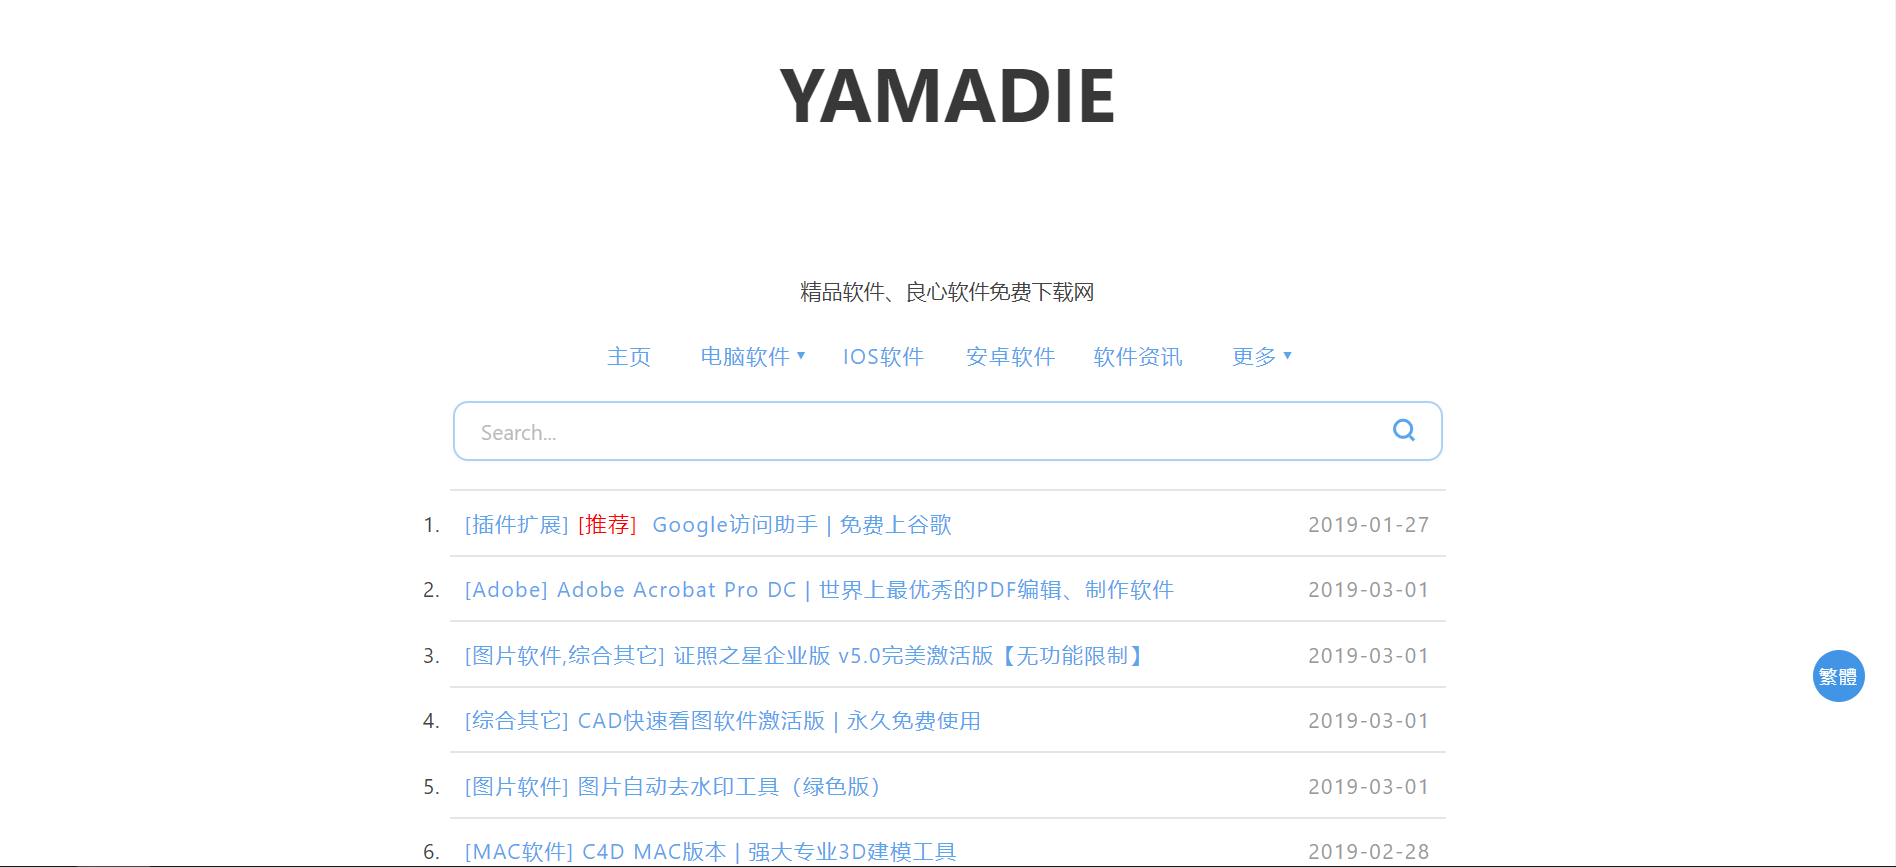 yamadie:精品软件下载网站